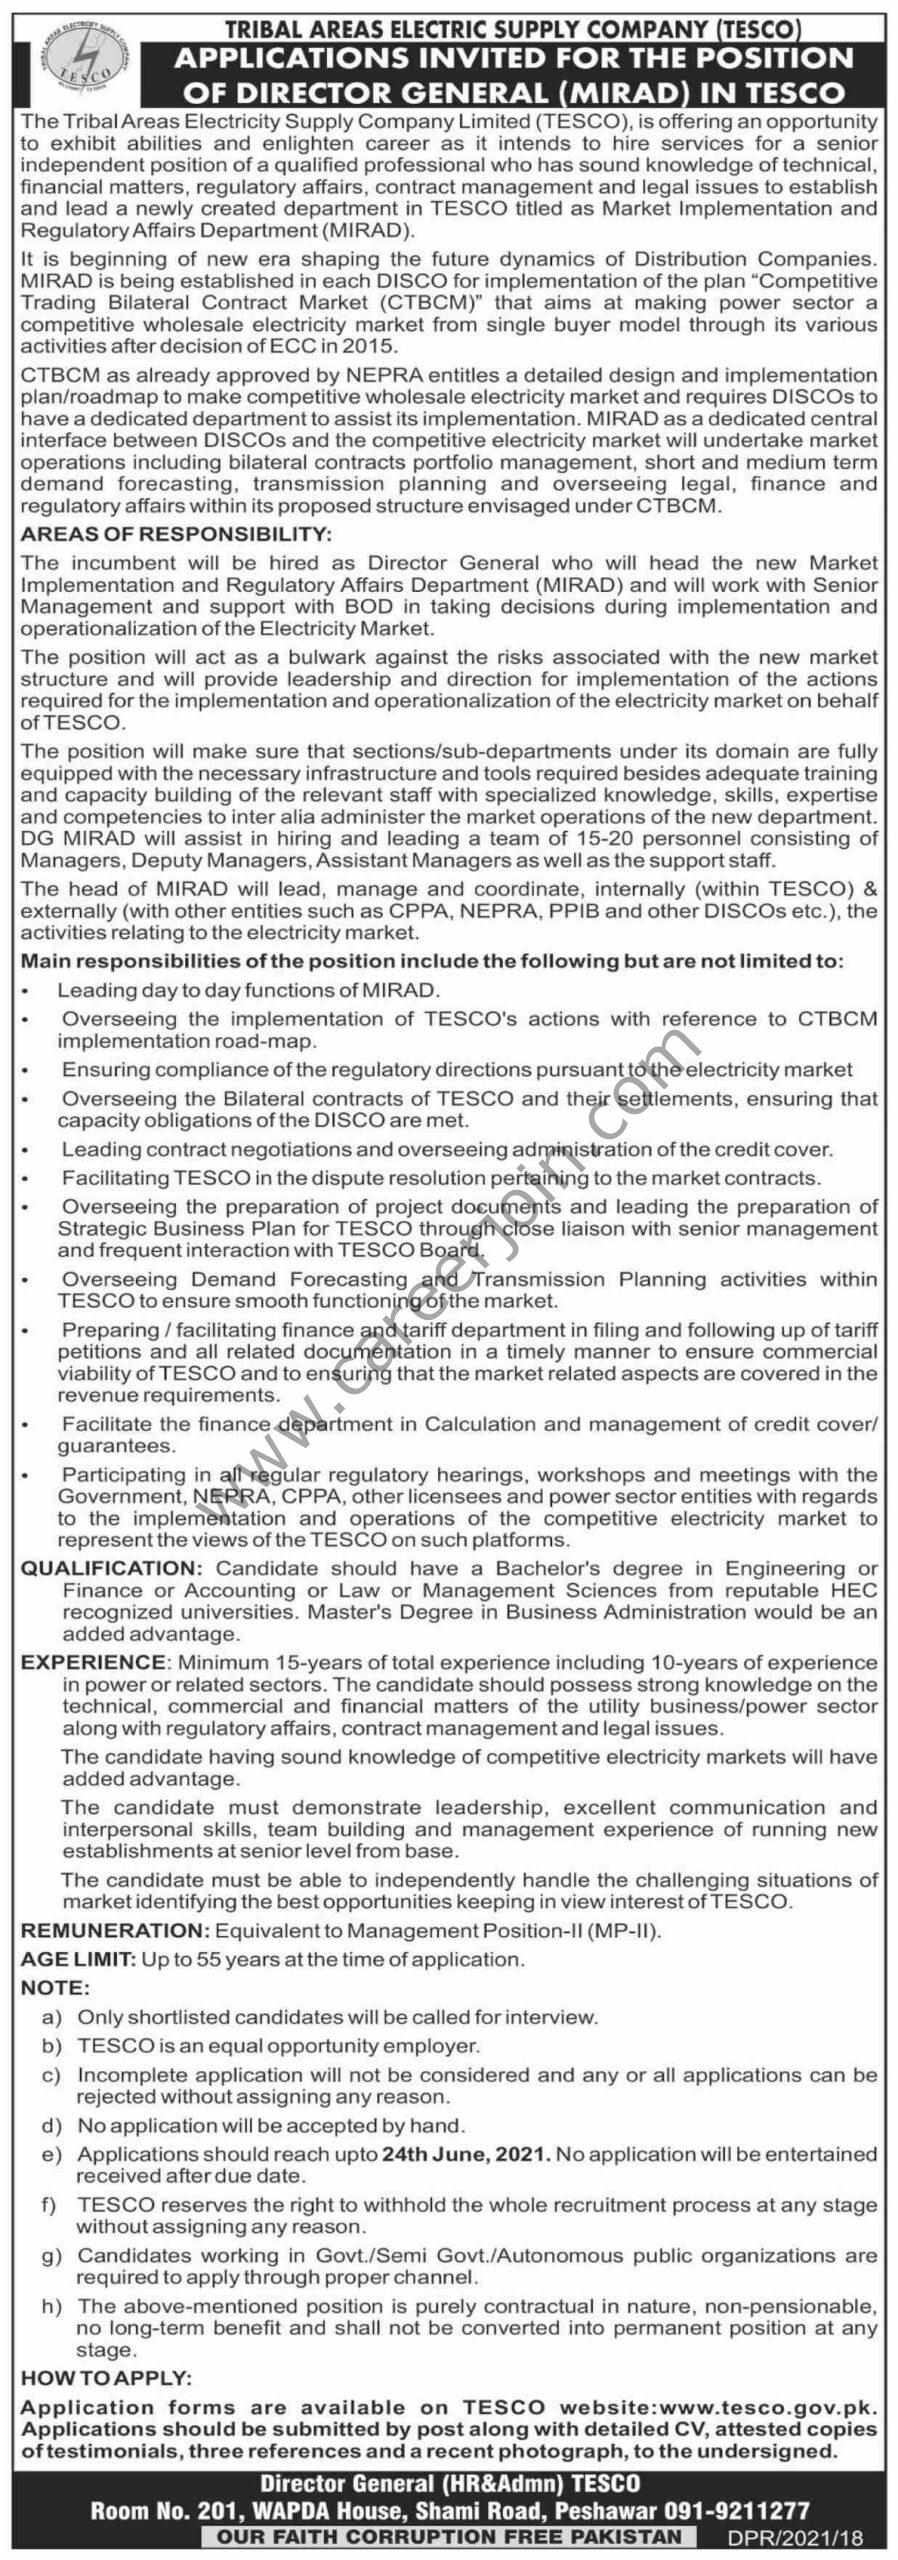 www.tesco.gov.pk - Tribal Areas Electric Supply Company TESCO Jobs 2021 For Director General - TESCO Jobs 2021